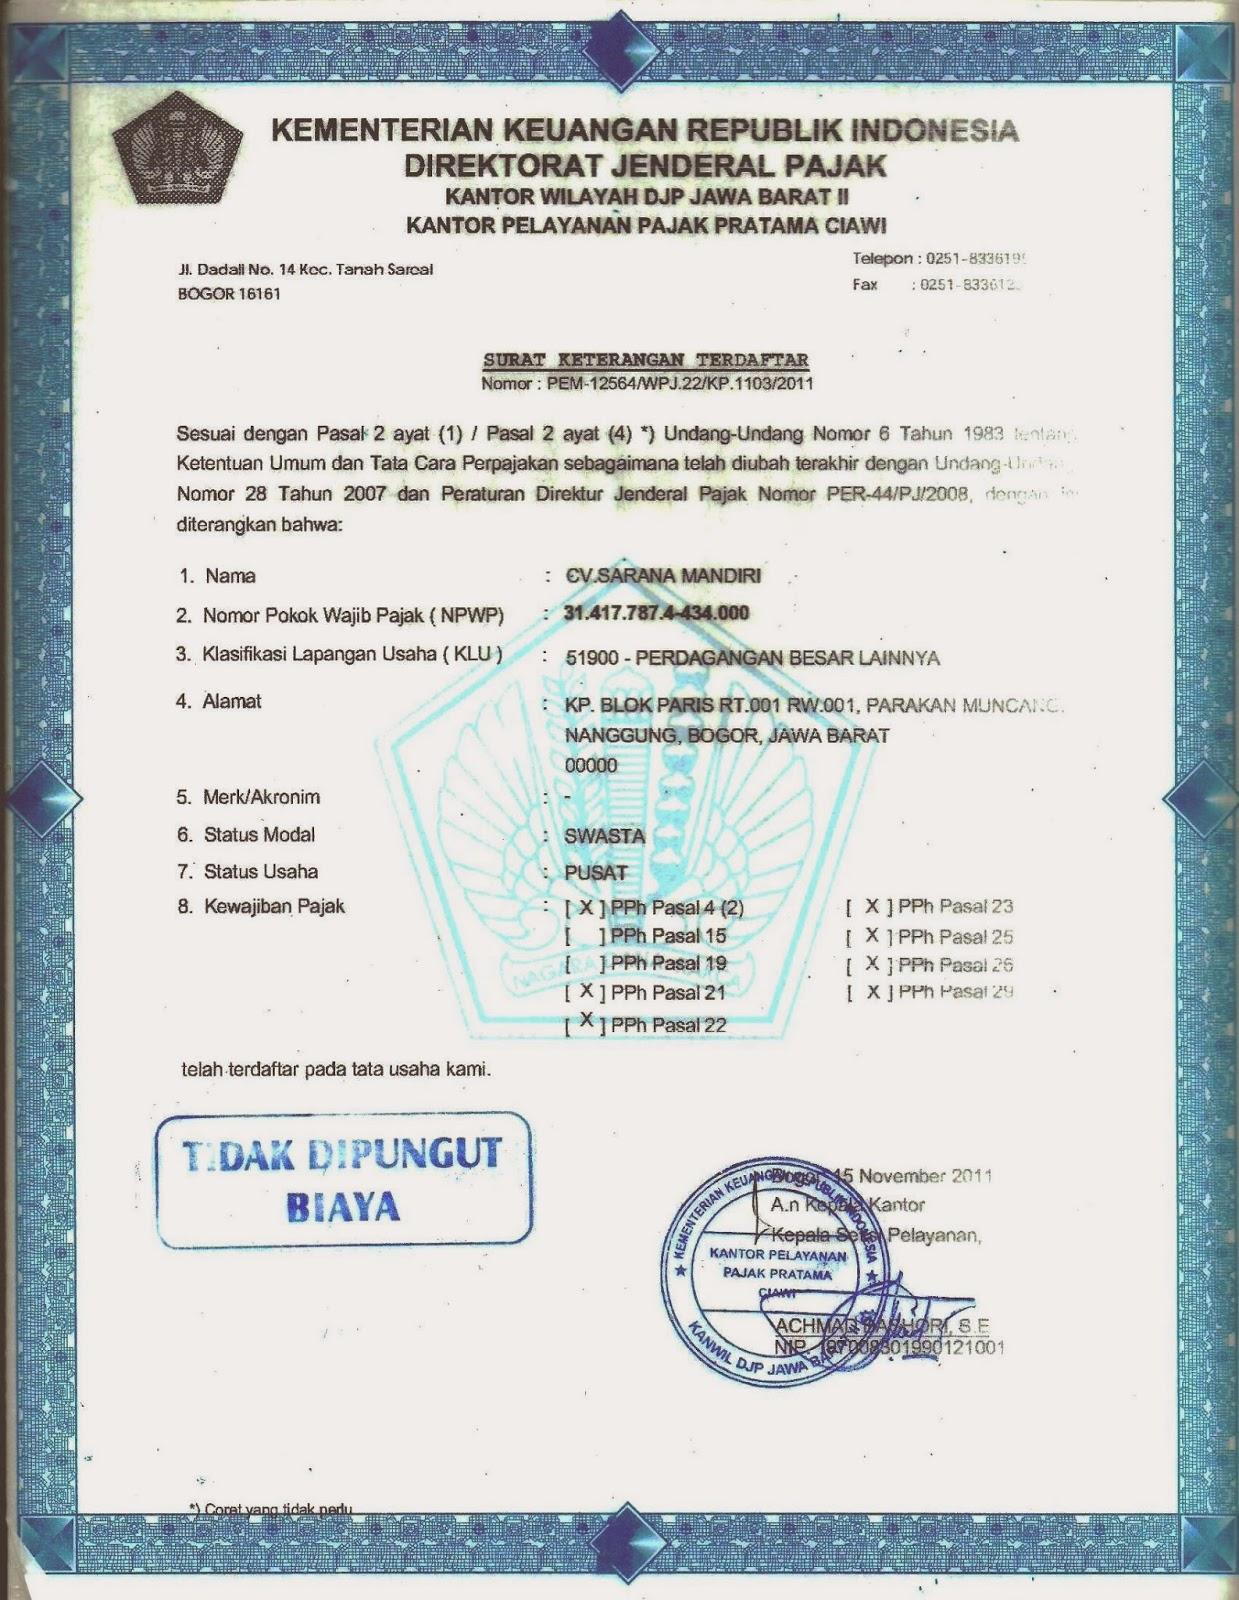 Sarana Mandiri Surat Keterangan Terdaftar Wajib Pajak